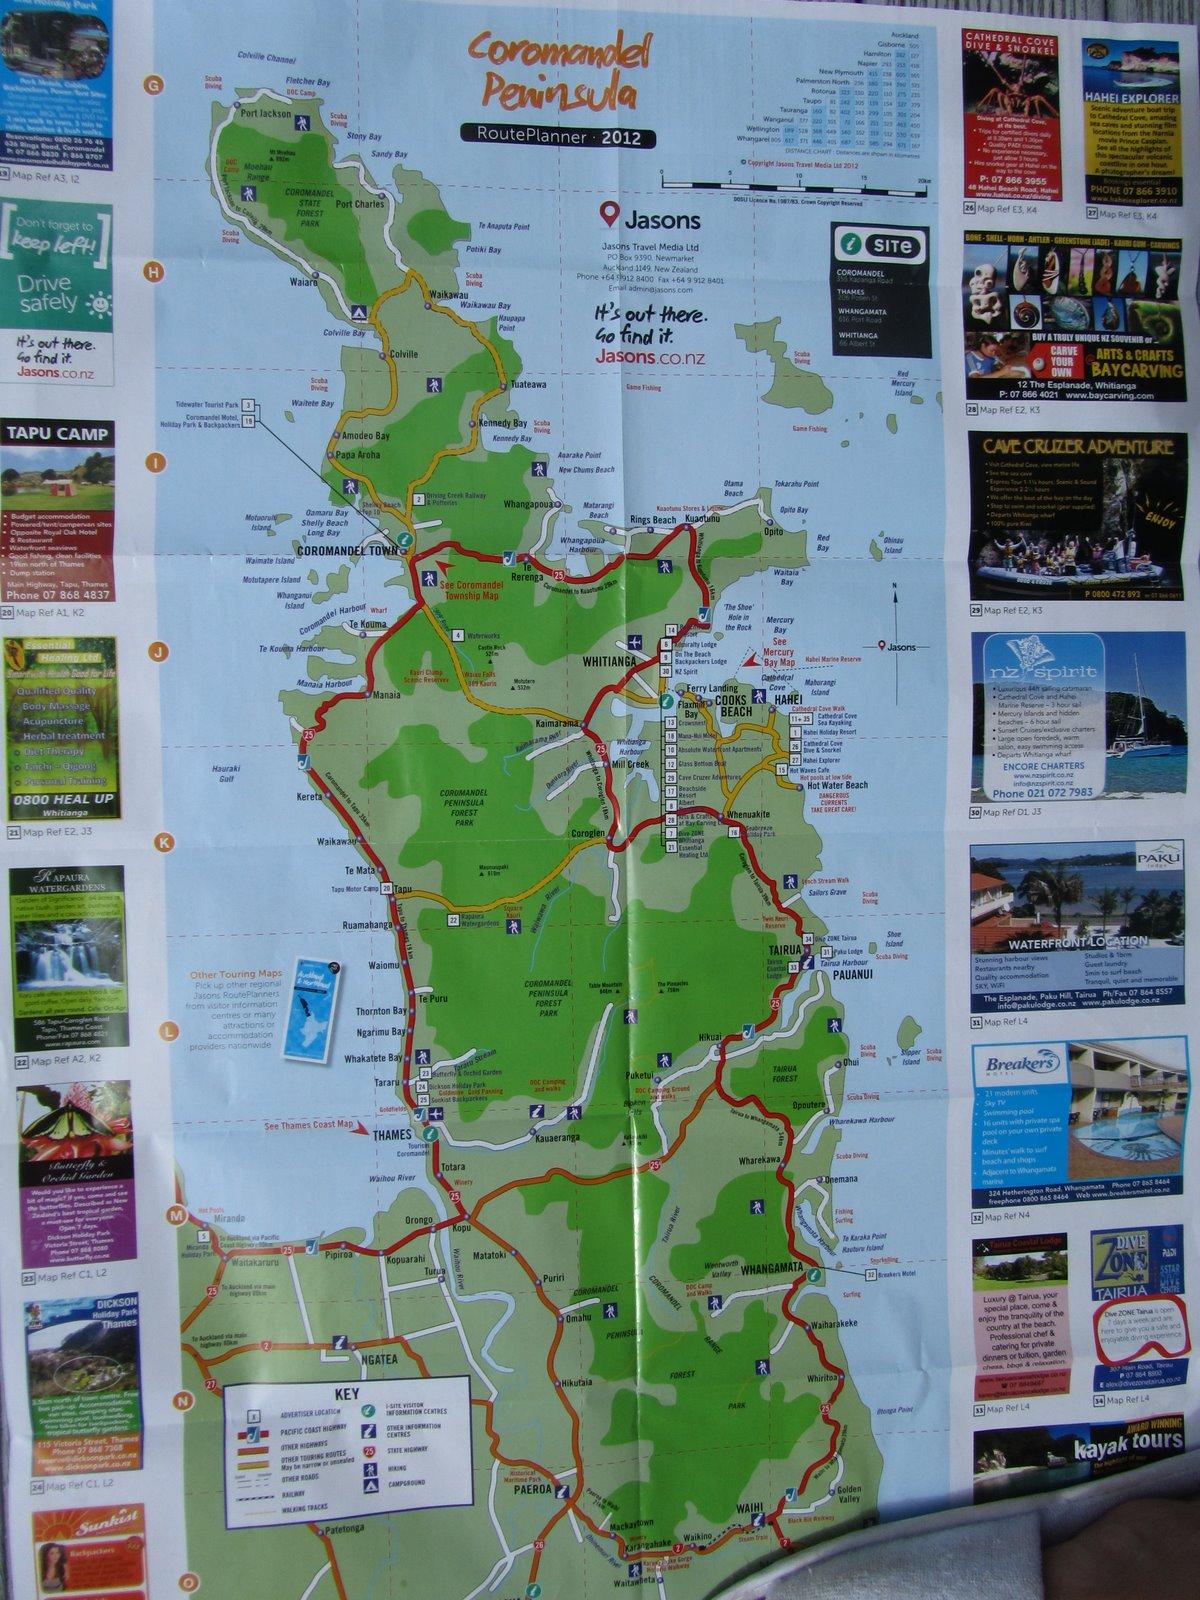 Magi and Sam: Map of Coromandel Peninsula. We sta a week ... Magi Map on robbers map, maginot line map, princess map, adventure map, google map, disney's map, mtg map, mavs map, mischief map,